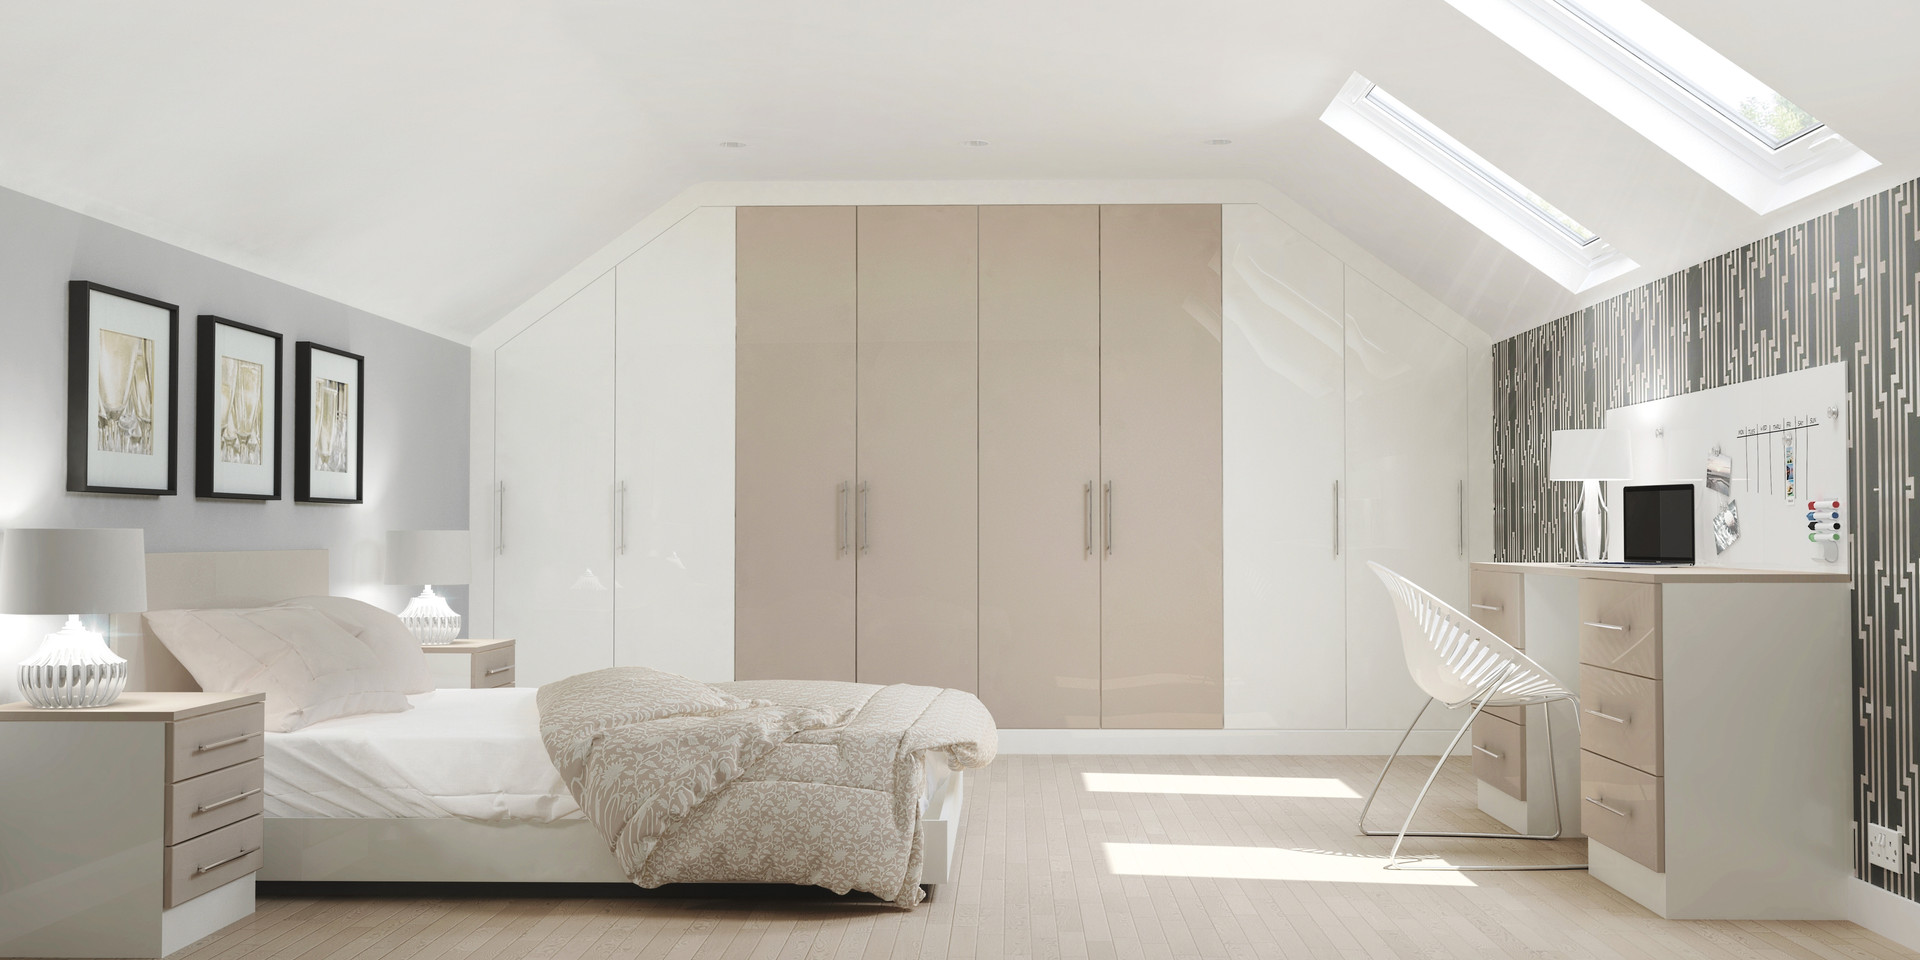 Glacier Bedrooms White and Metallic Champagne